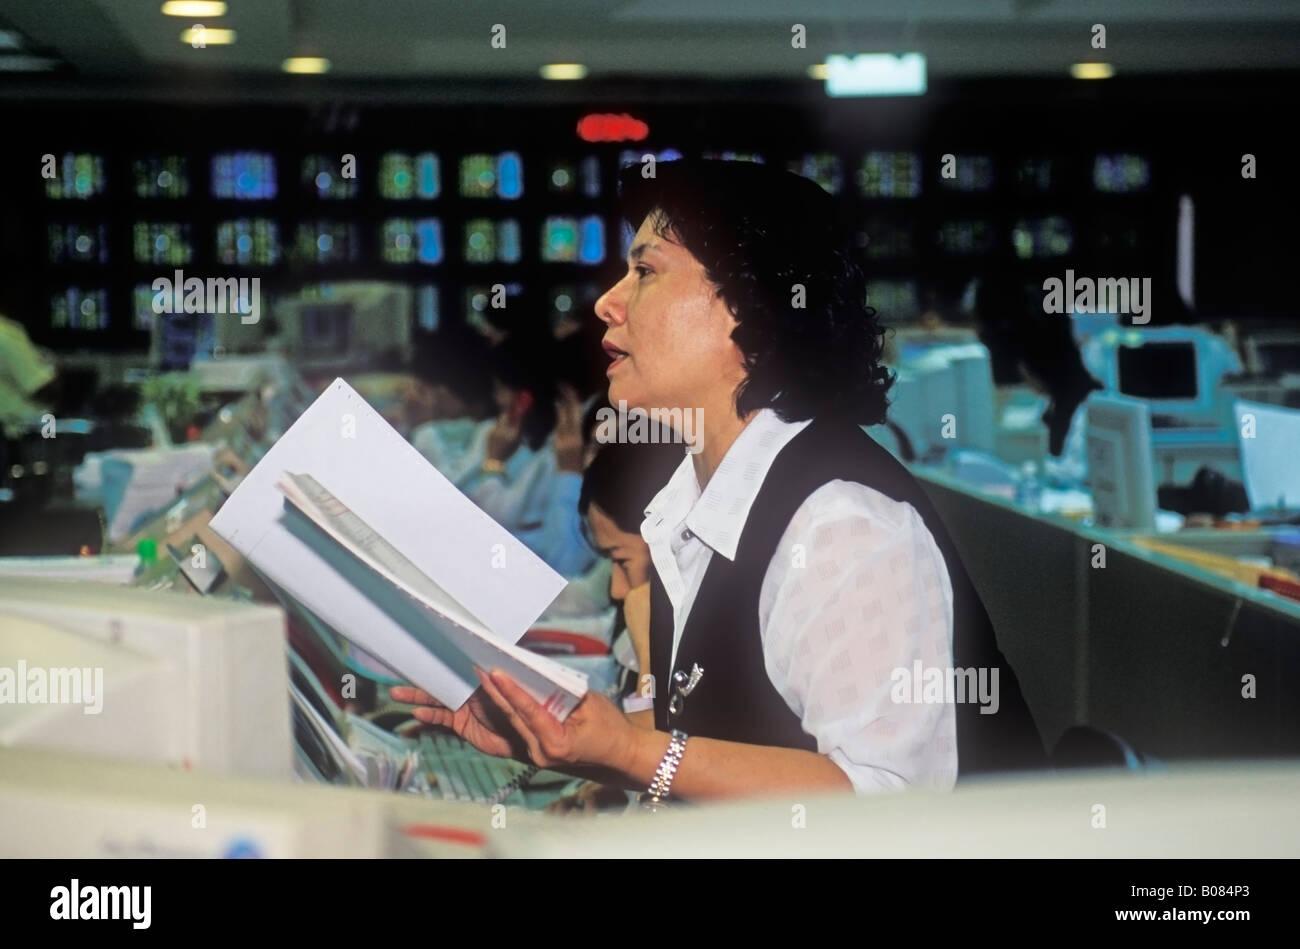 Woman Calling Out A Trade At Stock Trading Desk Taiwan China